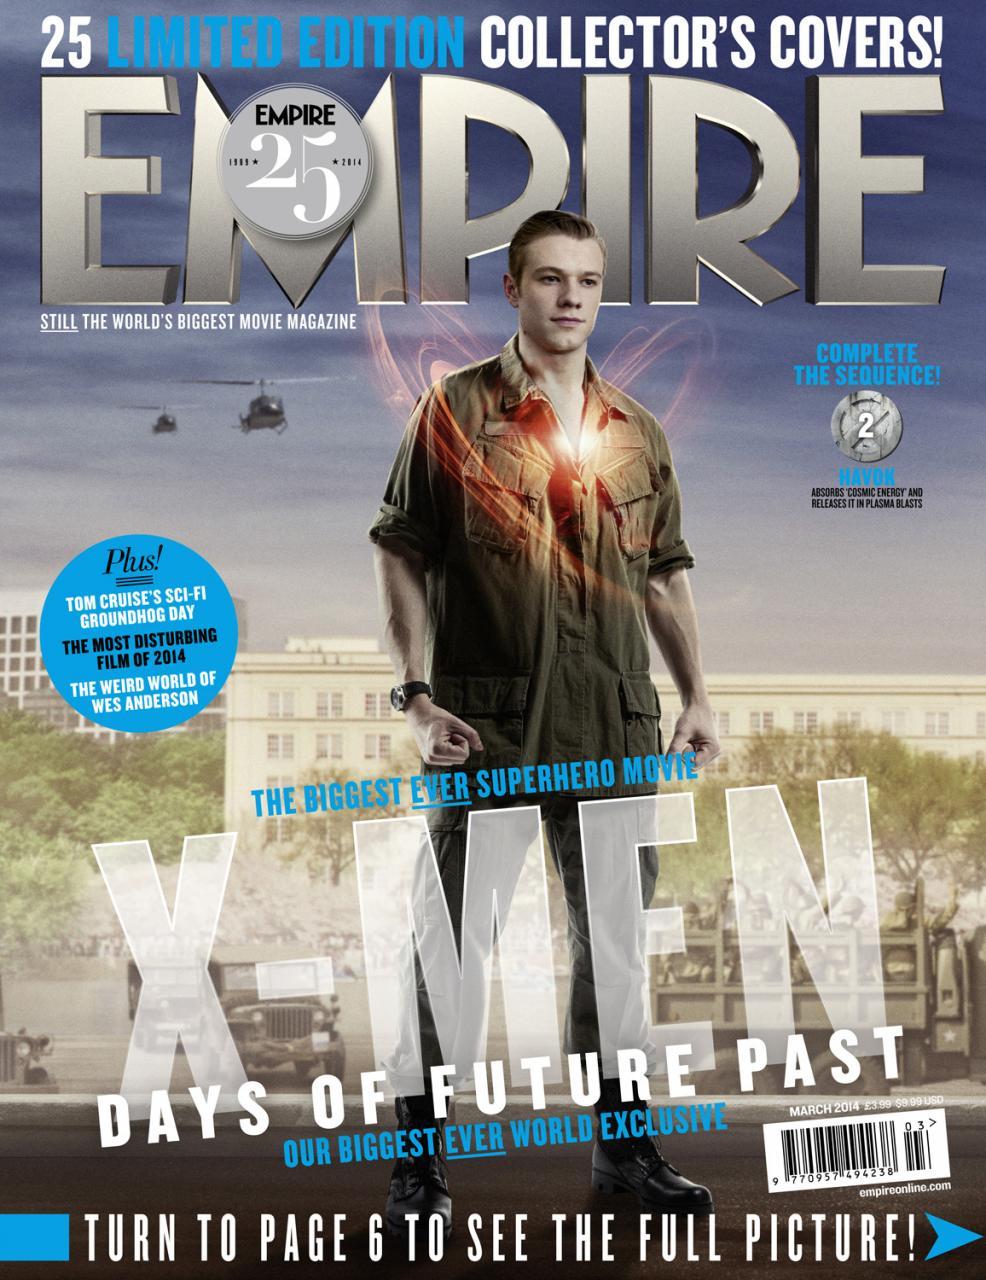 X-MEN DAYS OF FUTURE PAST Empire Magazine Covers  (15)